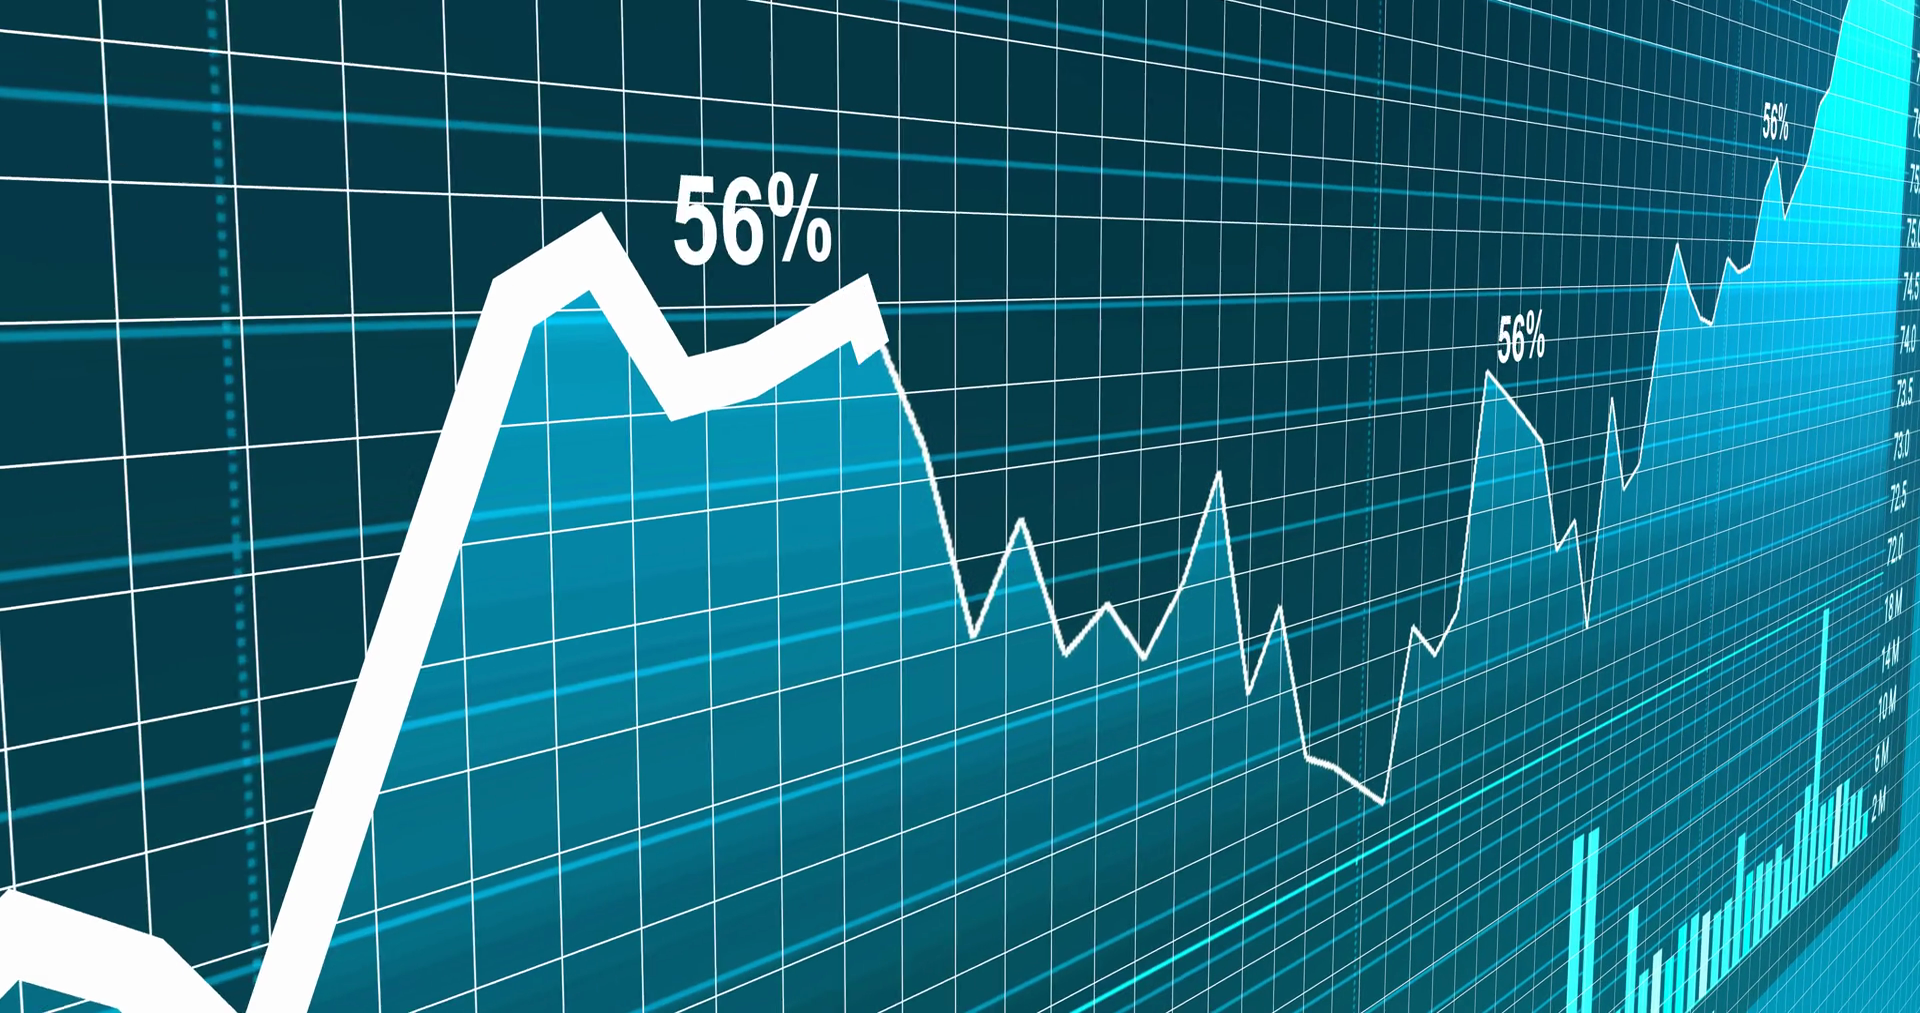 Stock Market Today: Markets Climb on Election Cycles